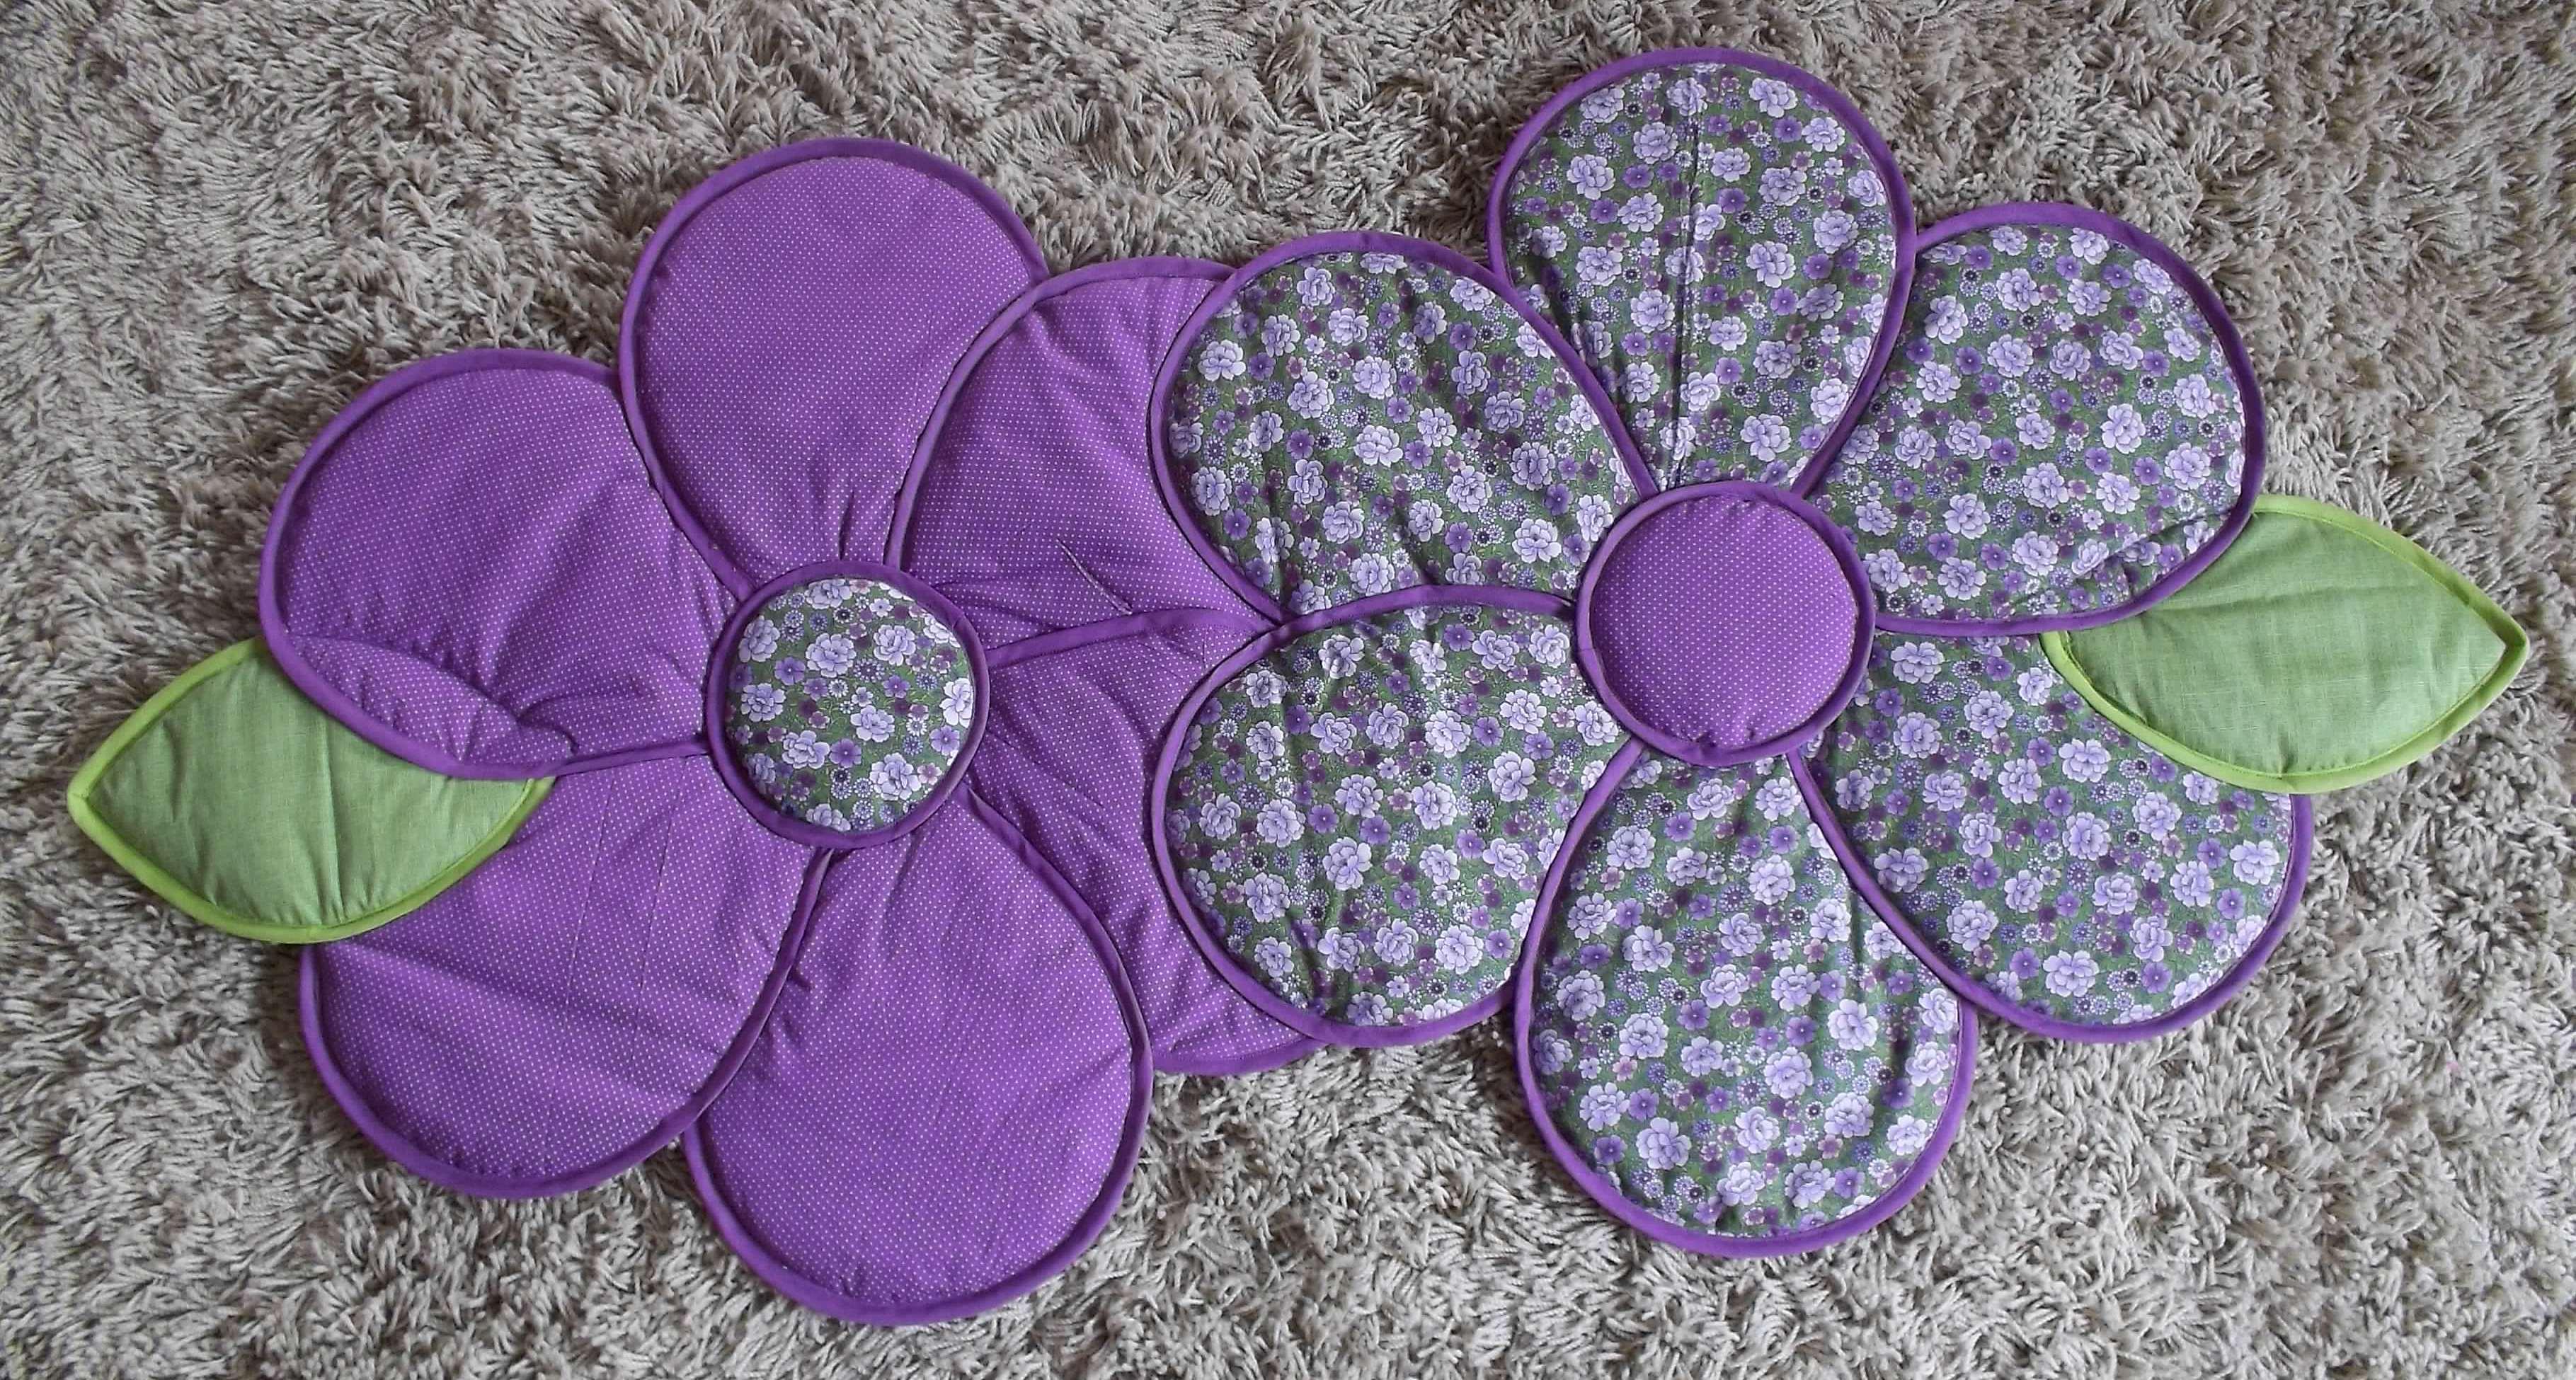 tapete flor dupla mimos em tecido by bianca dutra elo7. Black Bedroom Furniture Sets. Home Design Ideas